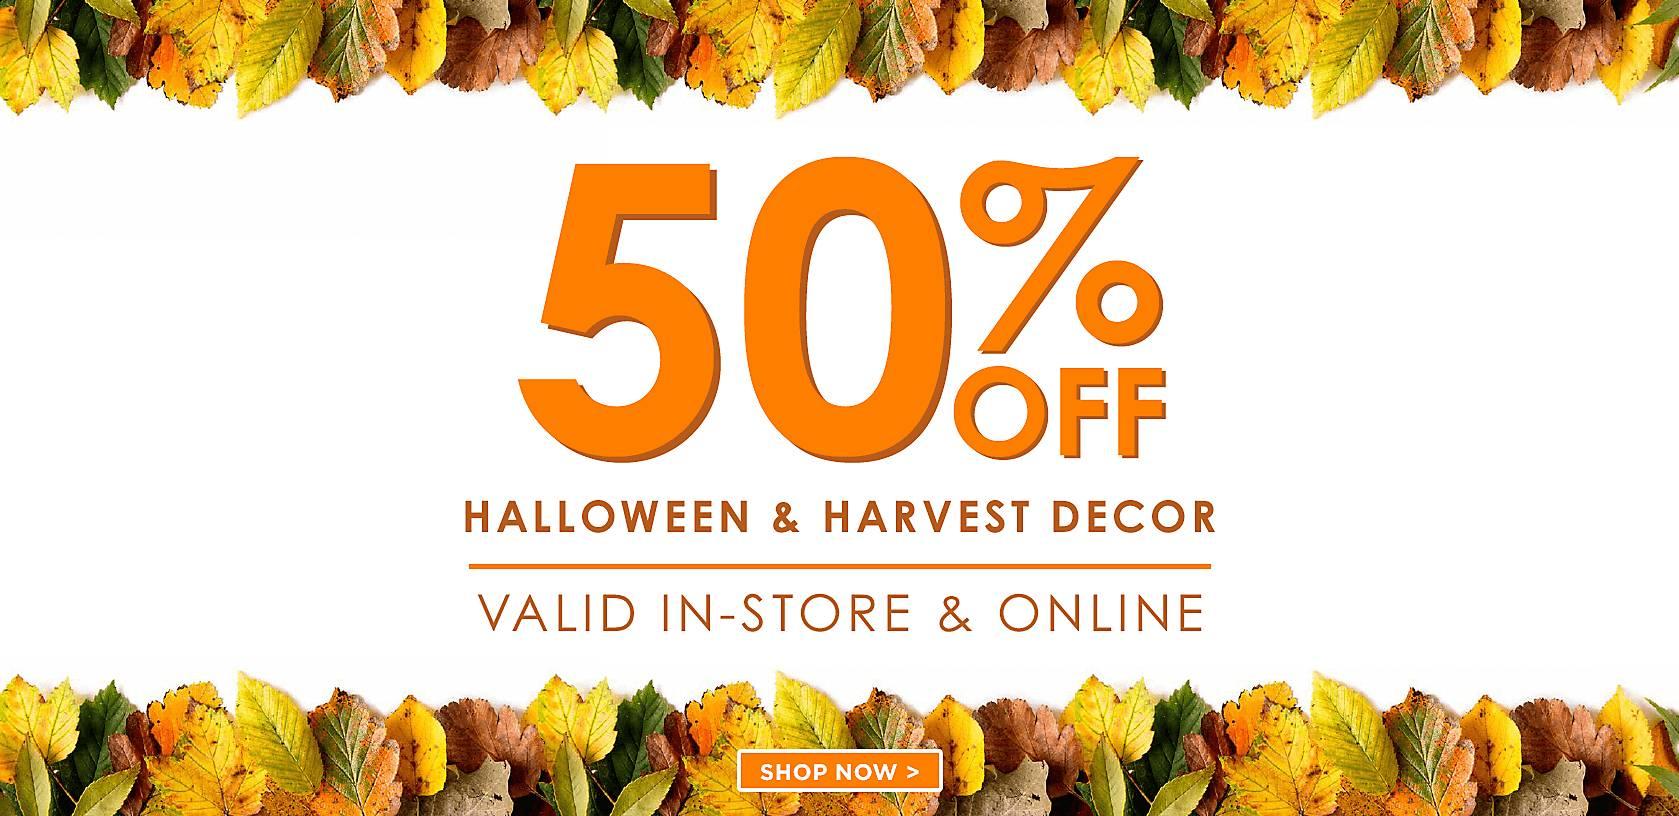 Kirklands coupons december 2013 - 50 Off Halloween And Harvest Shop Now